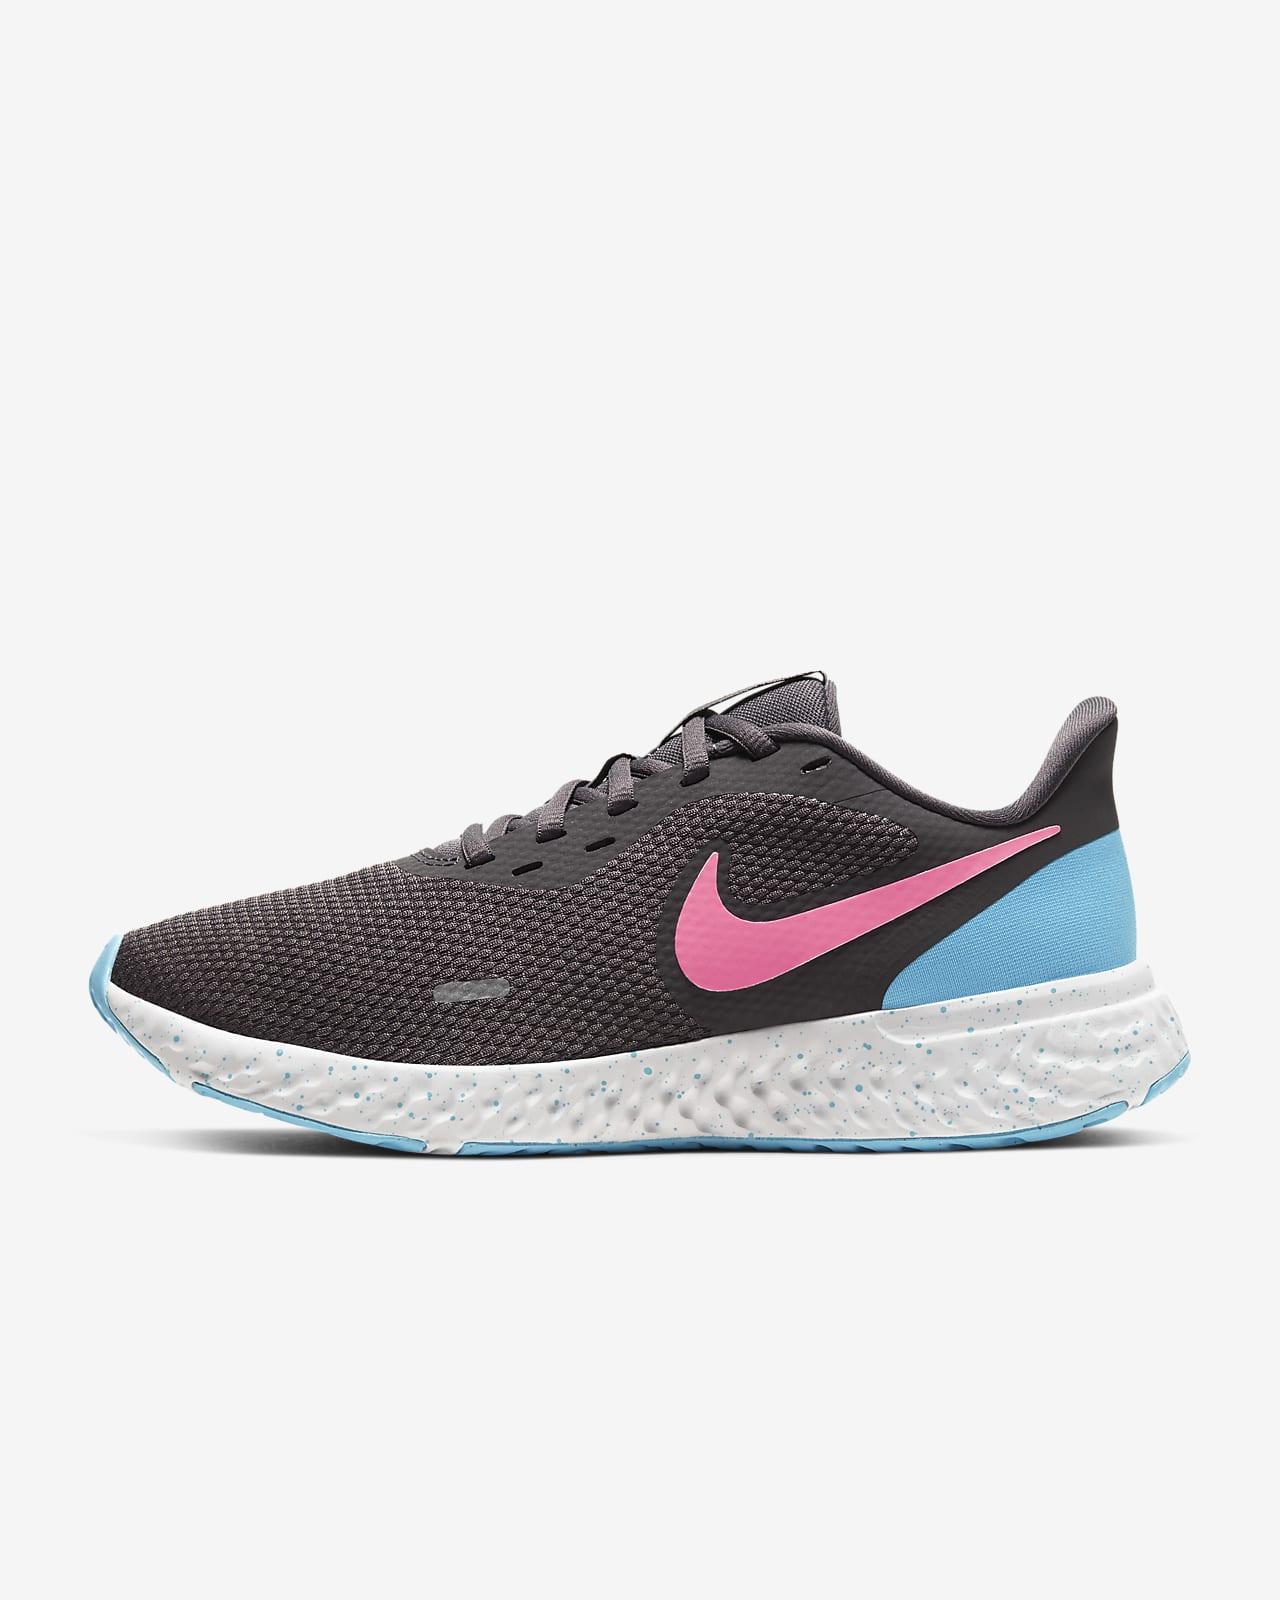 Chaussure de running Nike Revolution 5 pour Femme